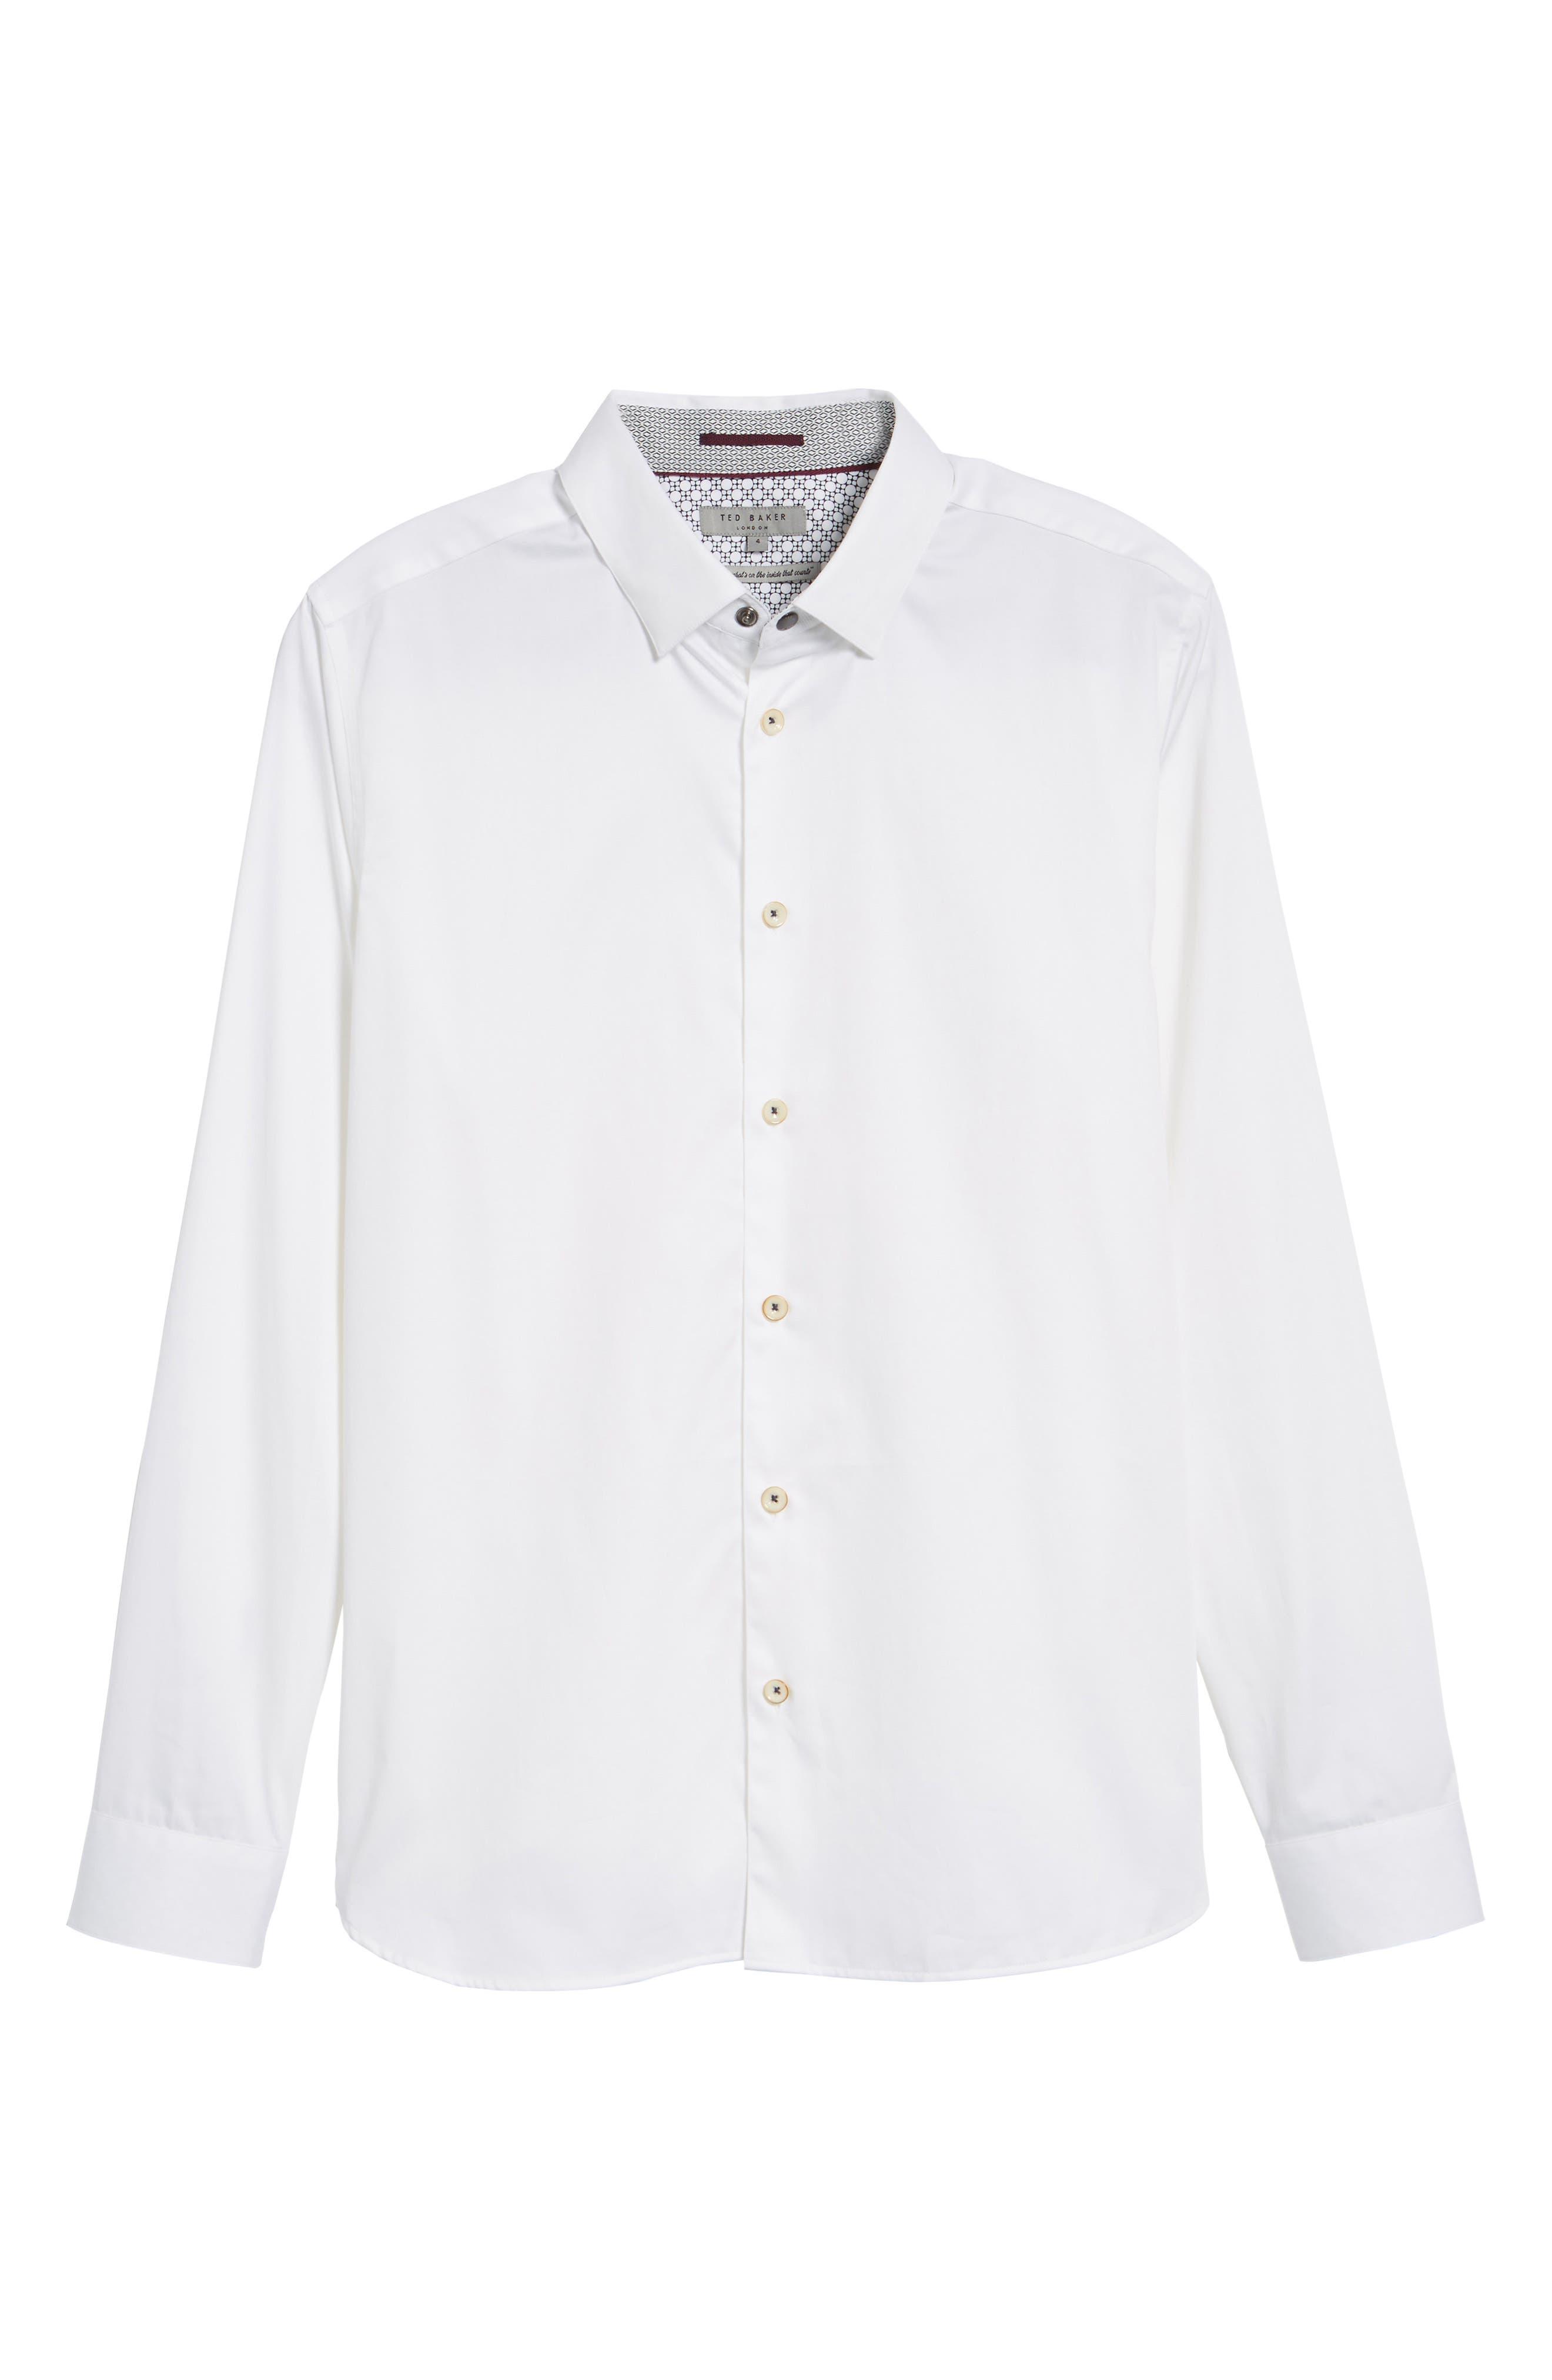 Byllytt Extra Slim Fit Stretch Solid Sport Shirt,                             Alternate thumbnail 6, color,                             100